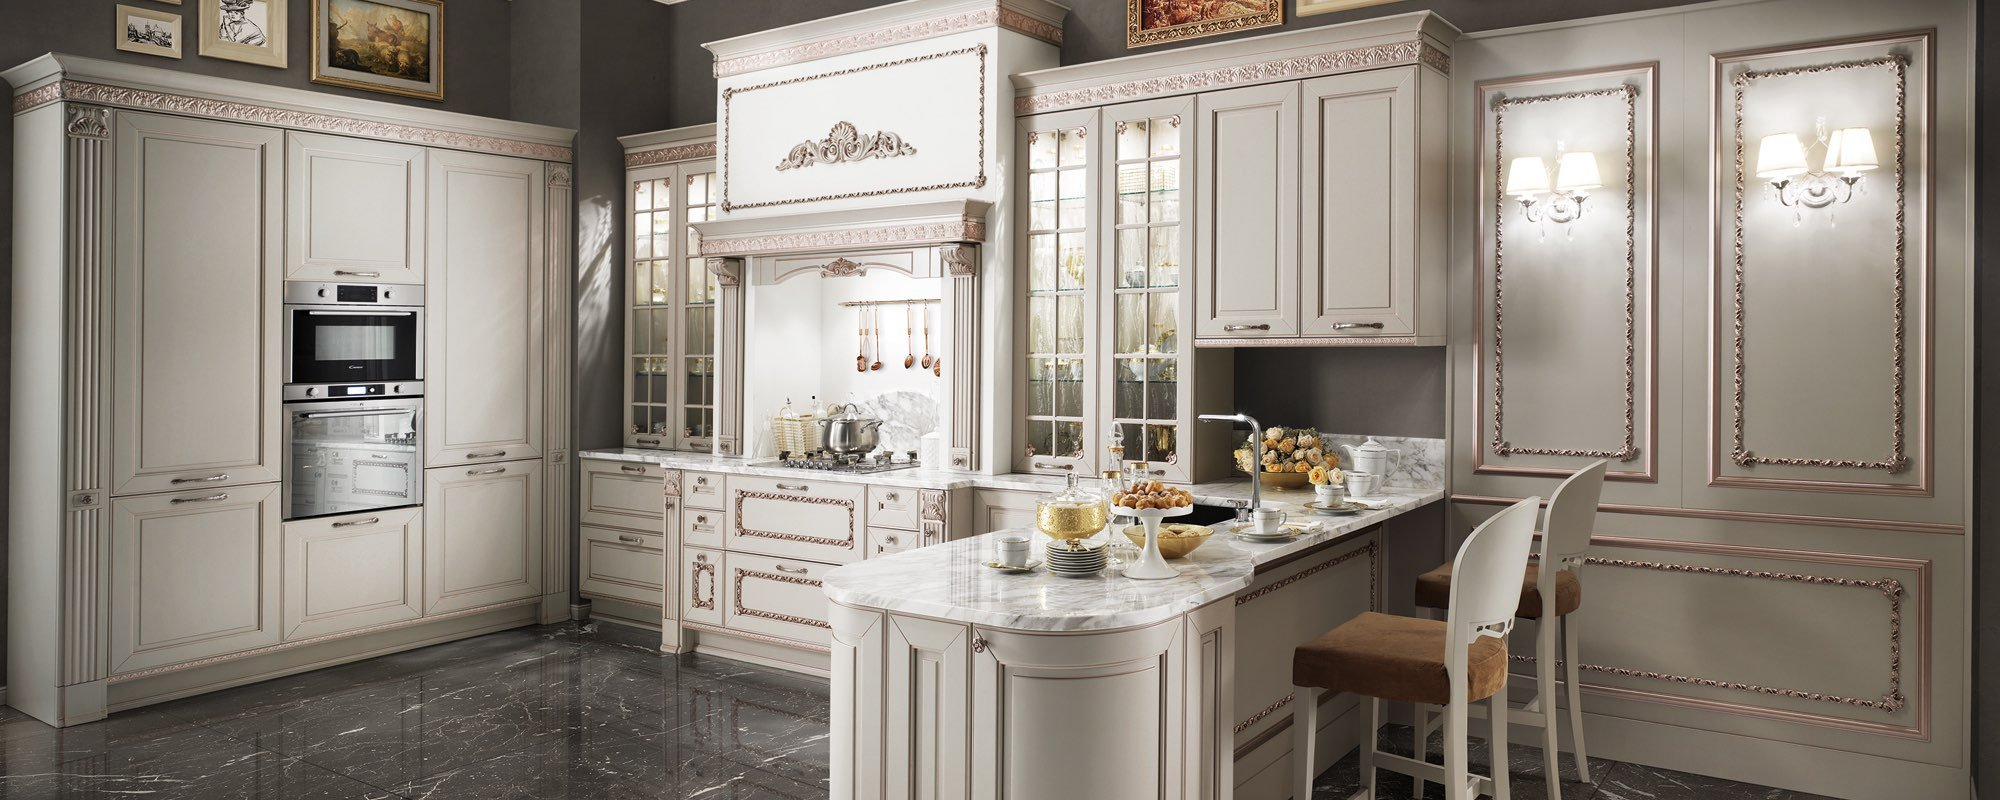 Sedie Stosa. Stunning La Cucina Replay Di Stosa Presenta Numerose ...